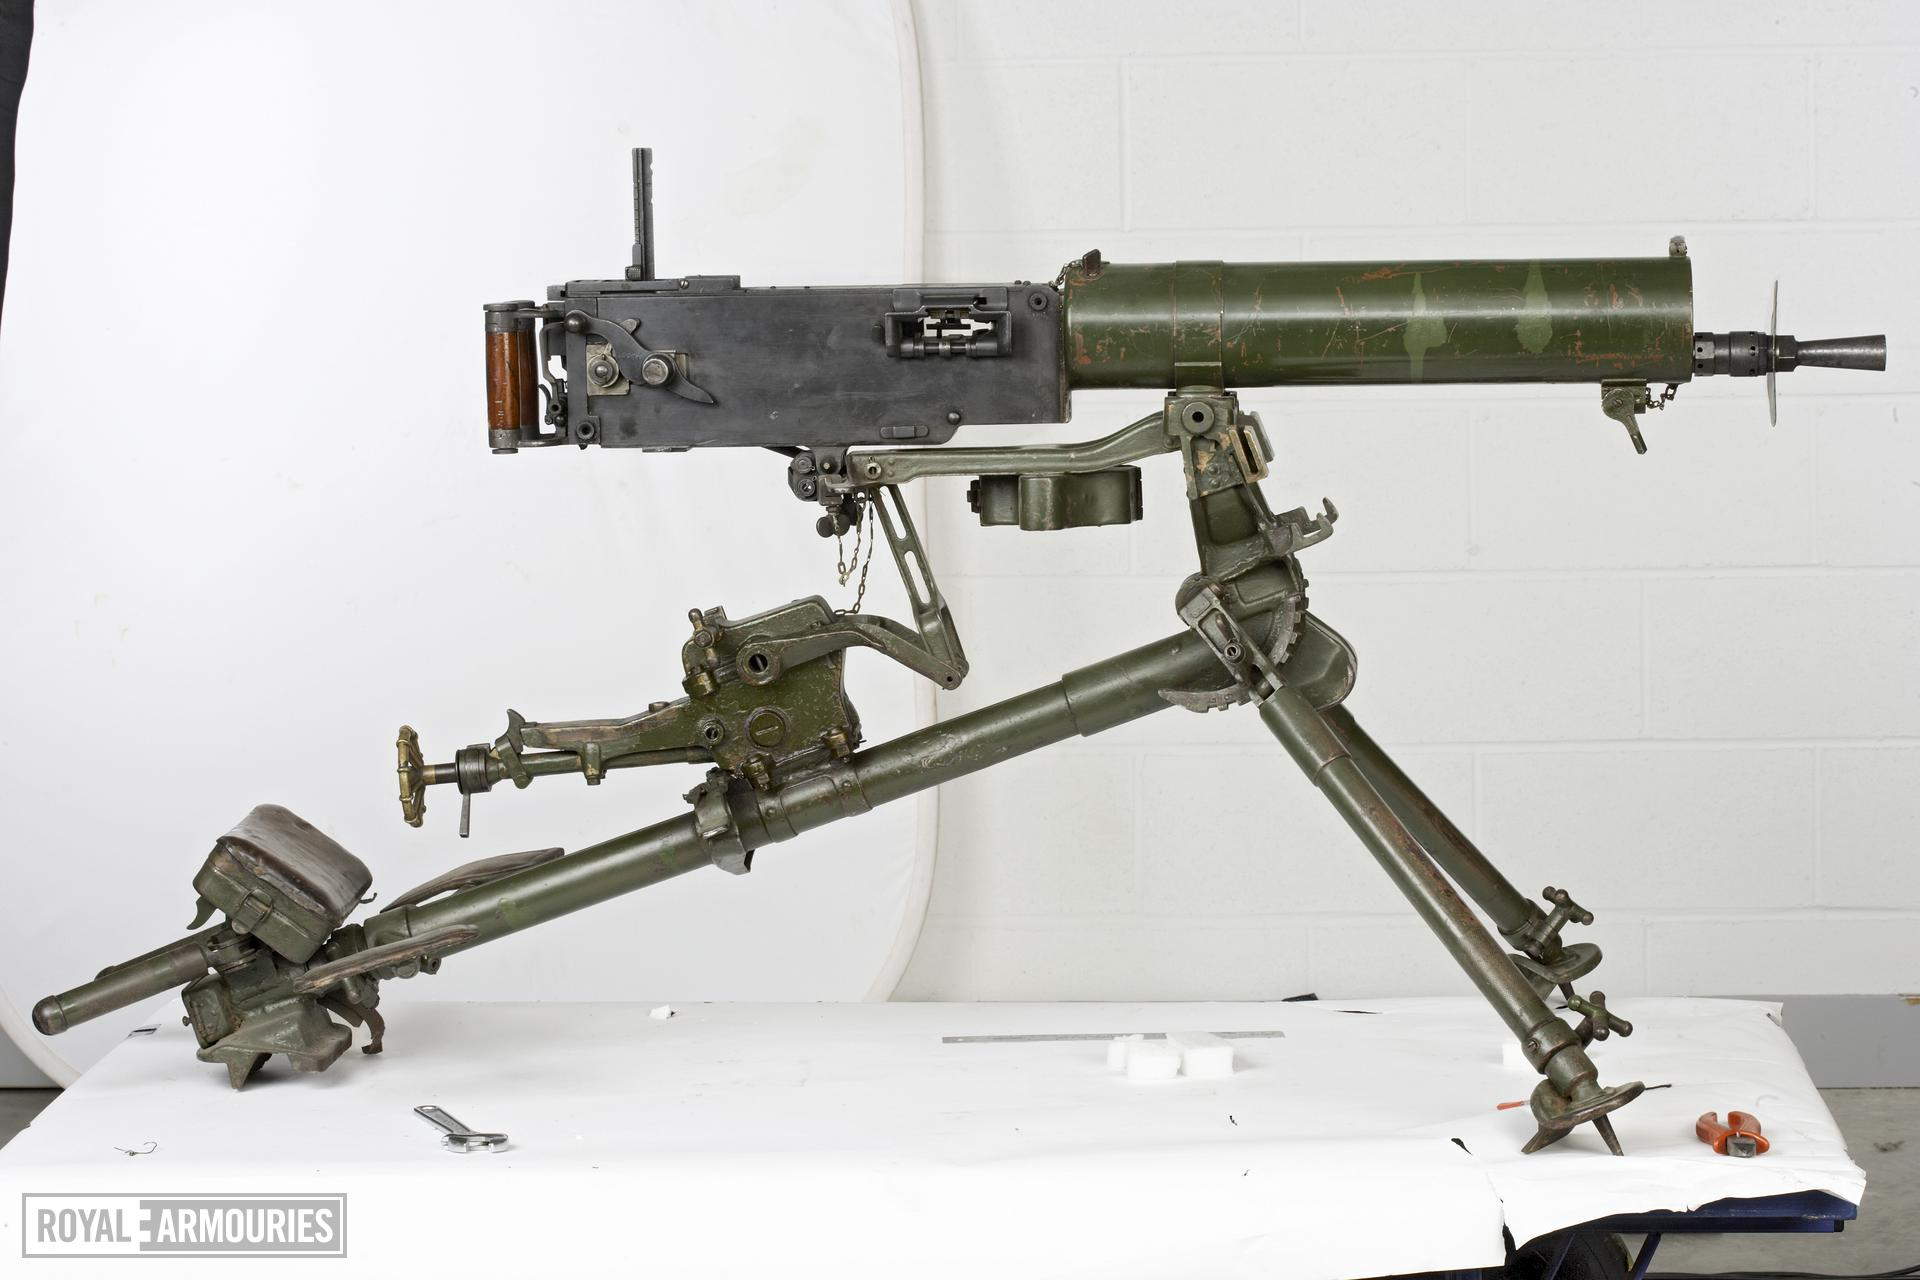 Centrefire automatic machine gun - Maxim Type 24